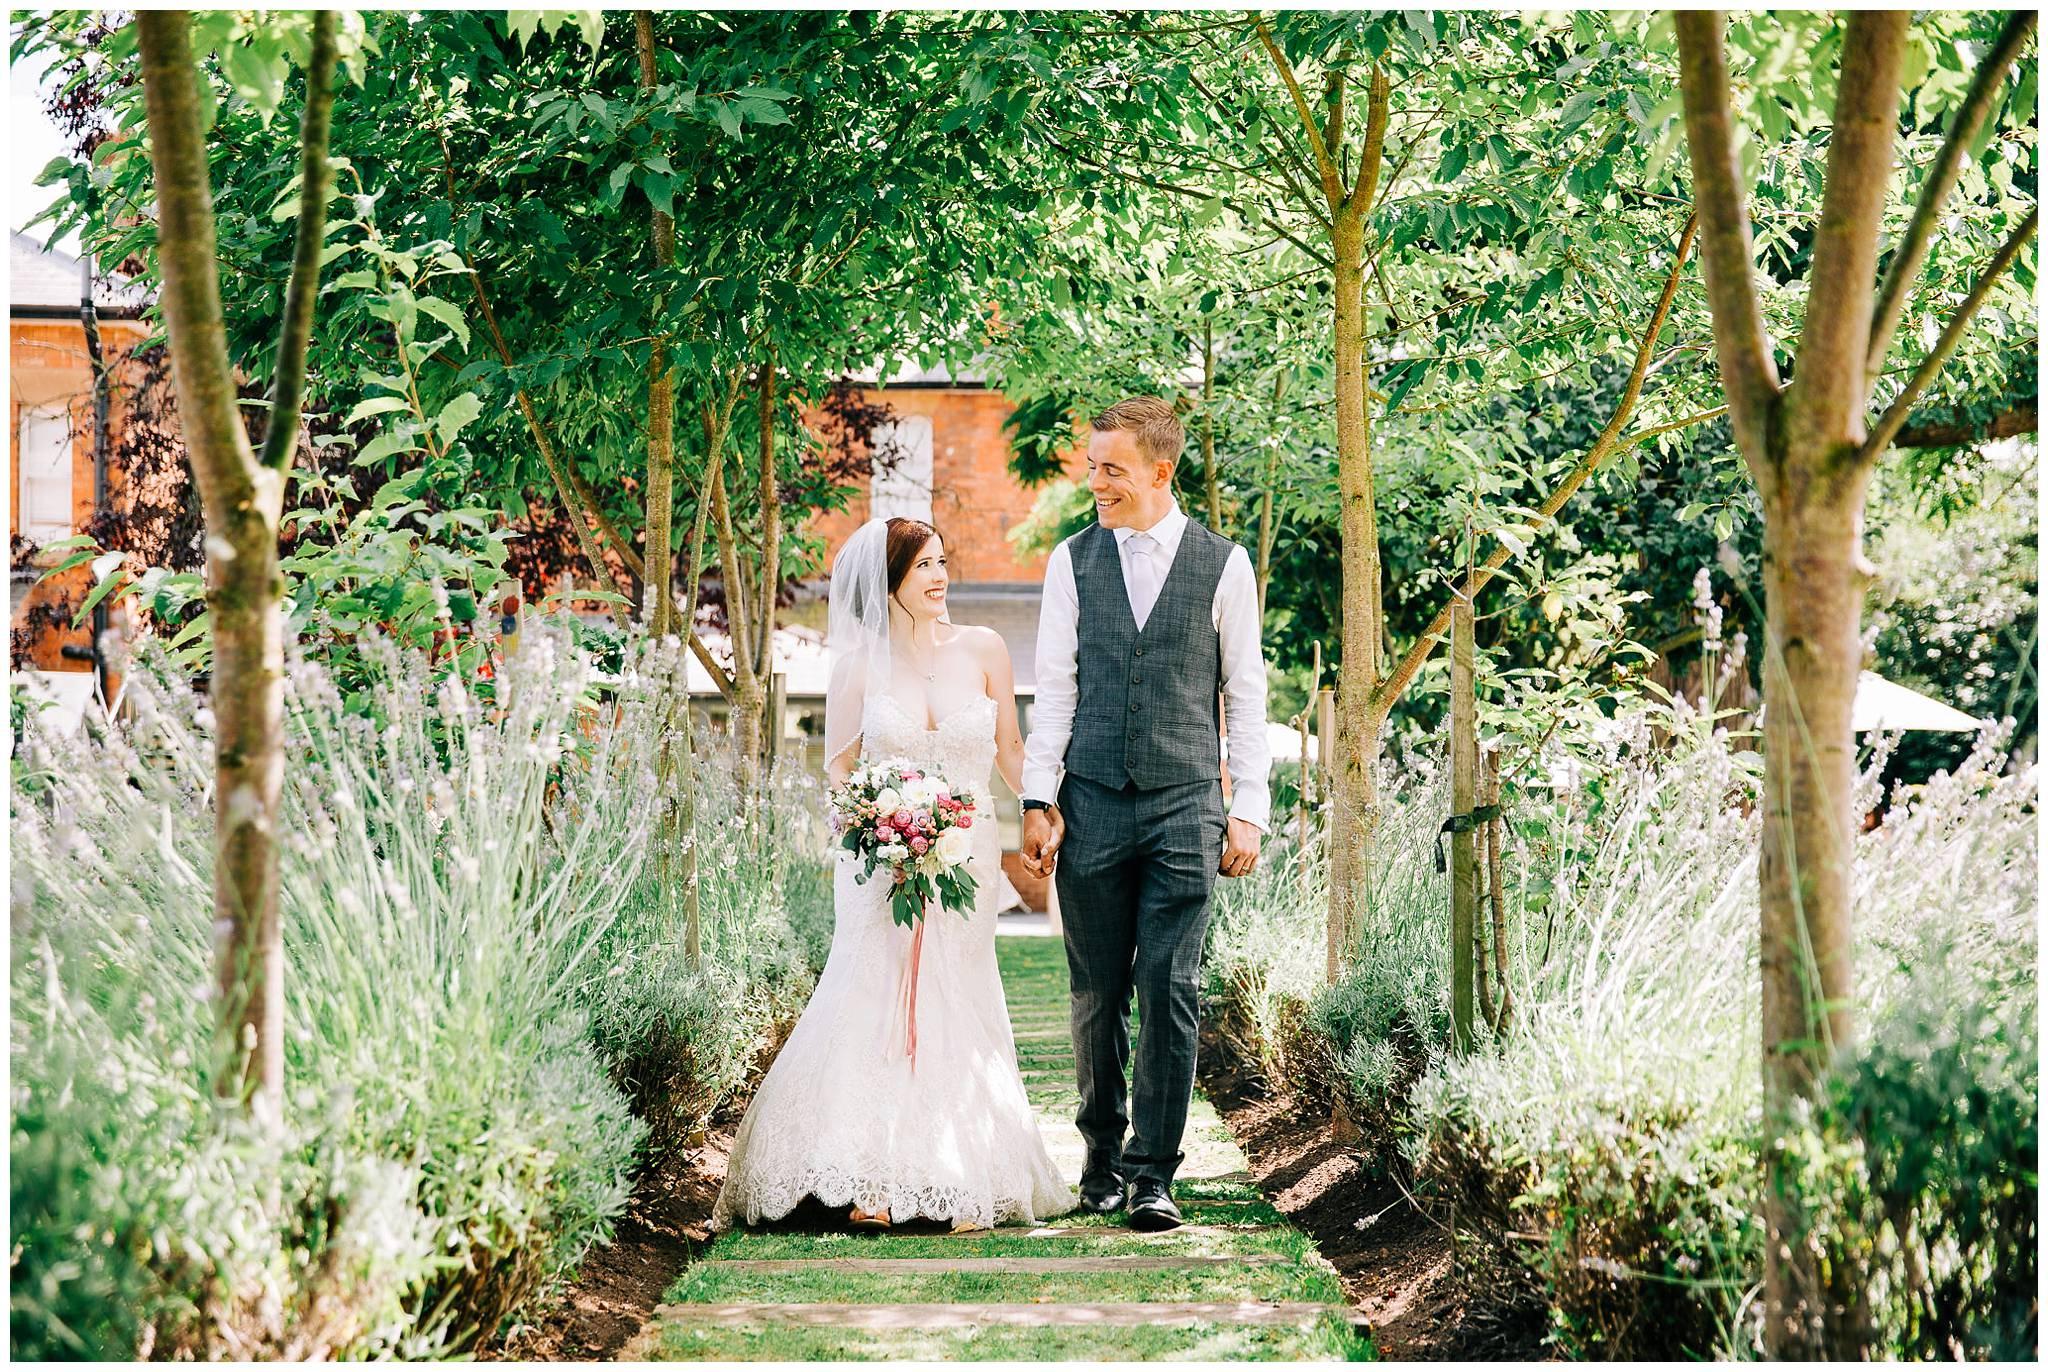 Summer Garden Wedding - The Old Vicarage Boutique Hotel59.jpg